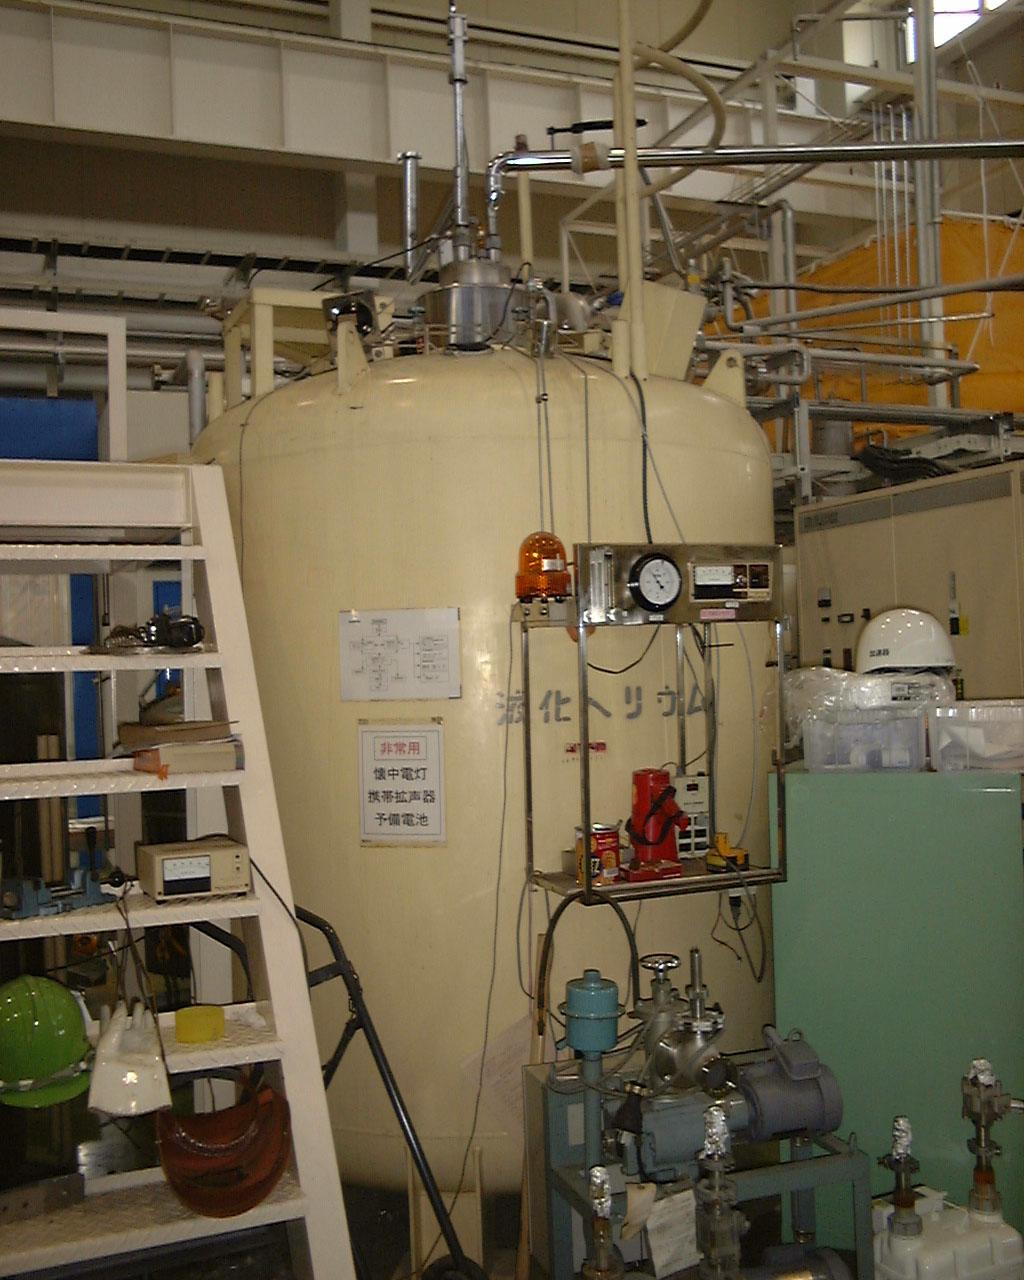 STF Web 2016        ヘリウム冷凍機設備 超伝導リニアック試験施設(STF)   STFの目的、概要